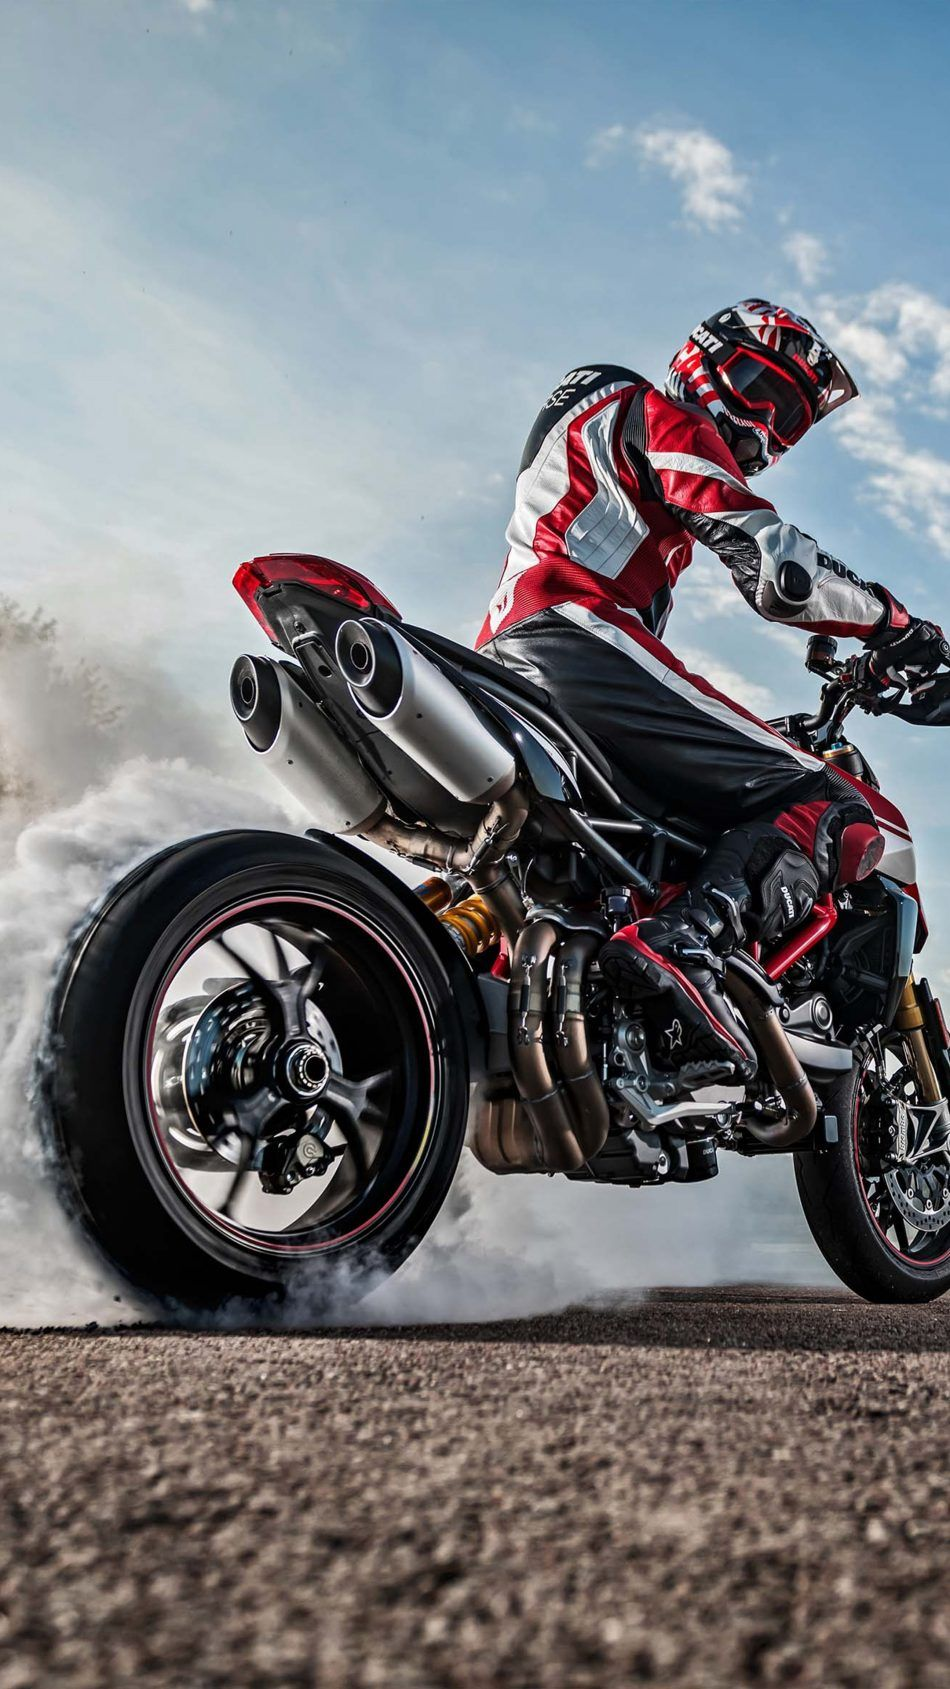 Ducati Hypermotard 950 Sp Bike Burnout Ducati Hypermotard Moto